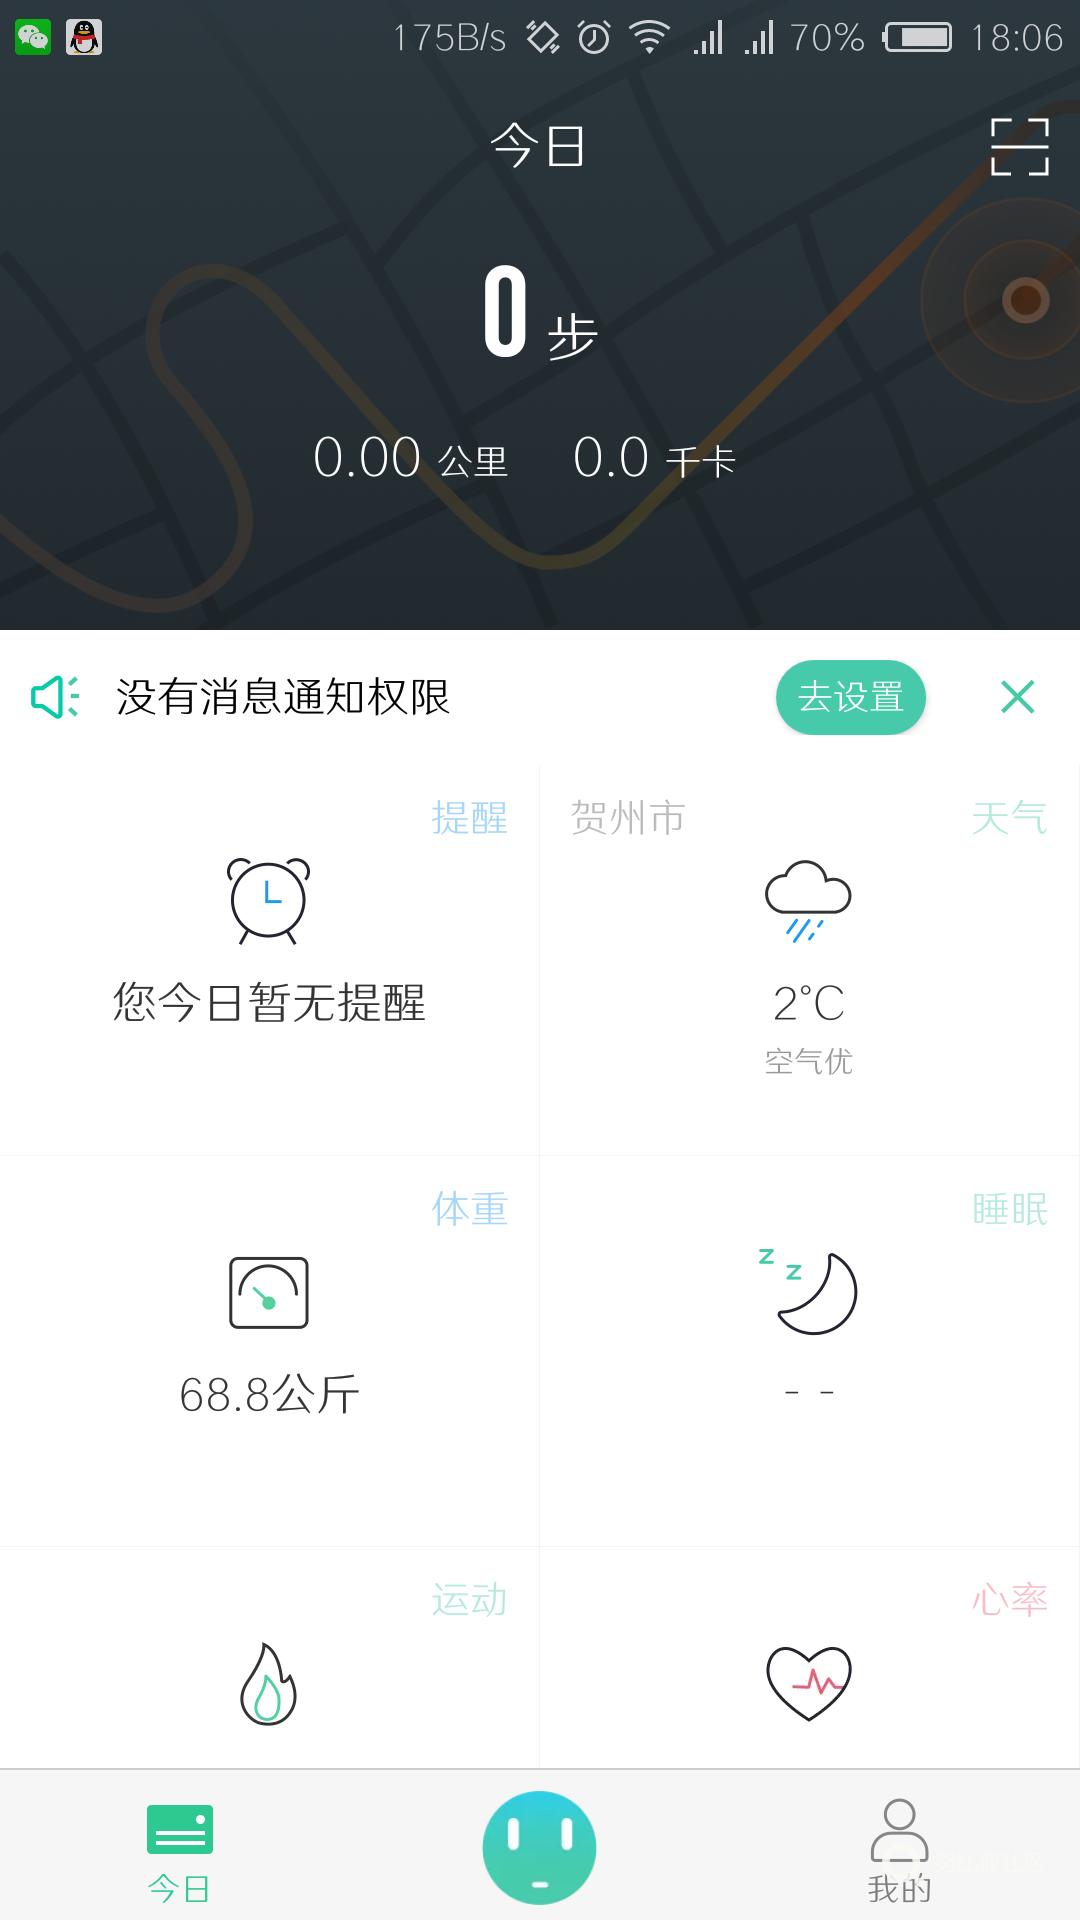 Screenshot_2018-01-28-18-06-48.png